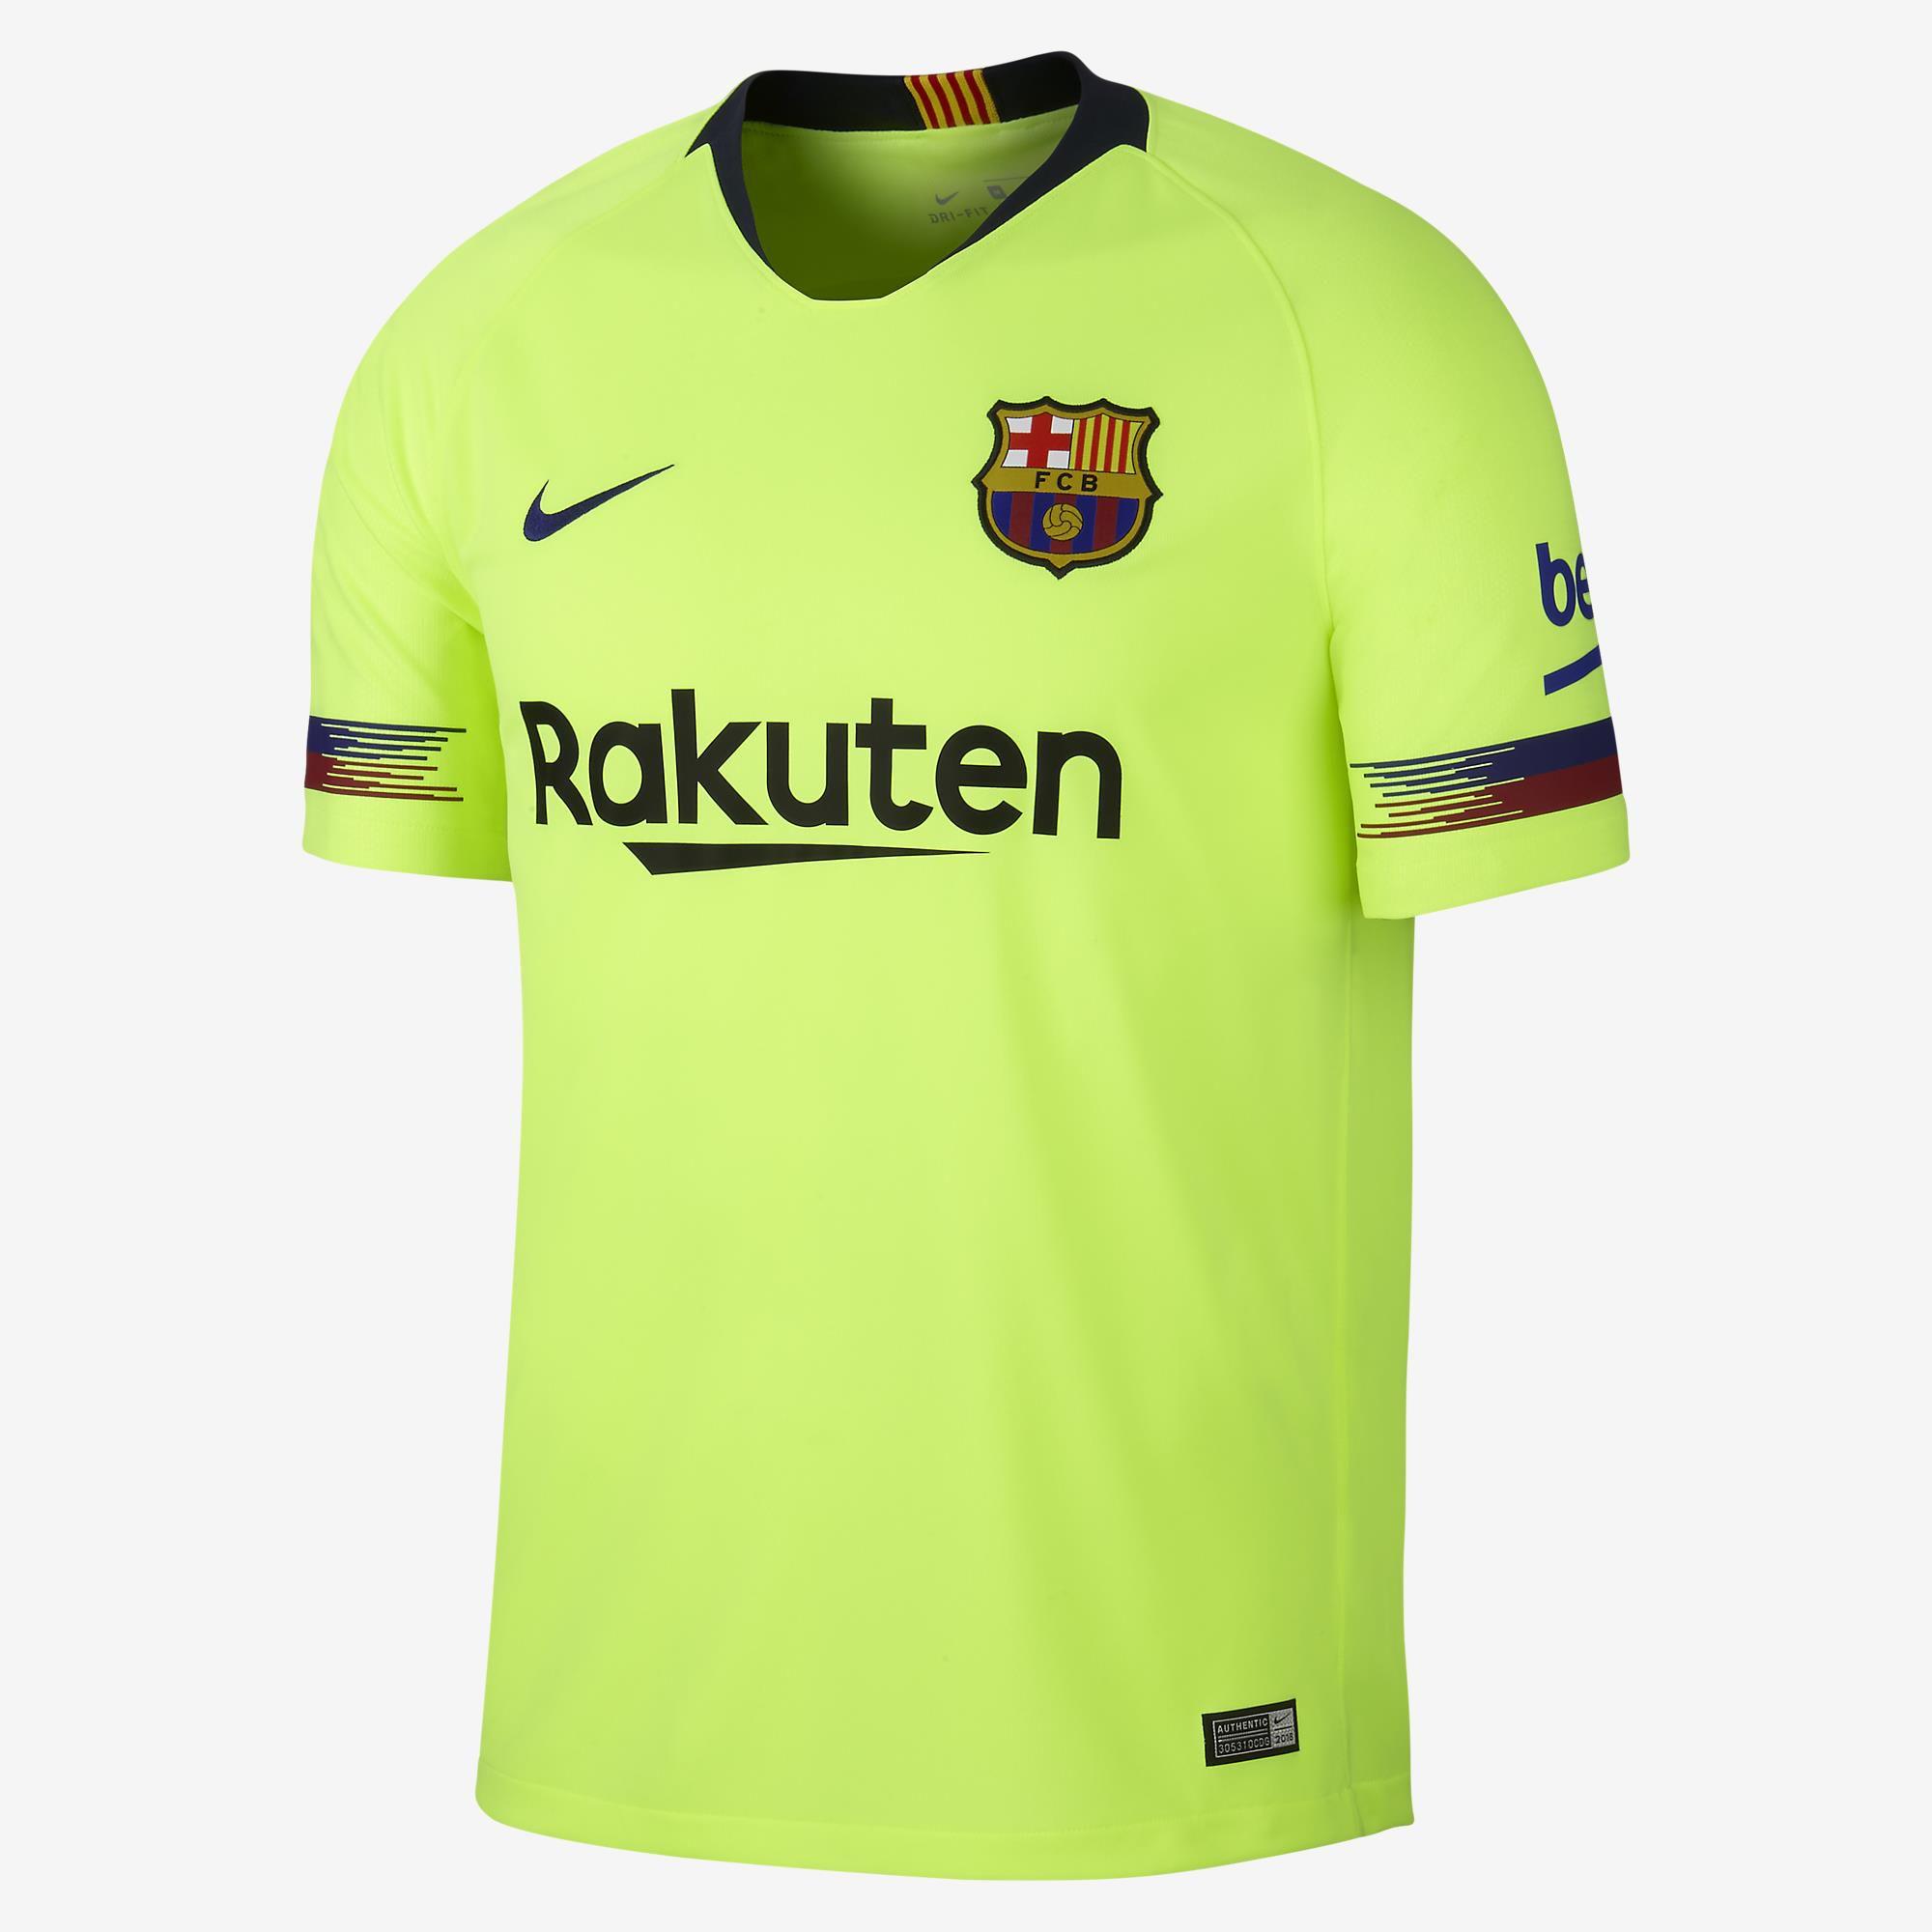 81a45b0d45690 Camisa Nike Barcelona II Original Amarelo - 2018 19 - Titanes Esportes